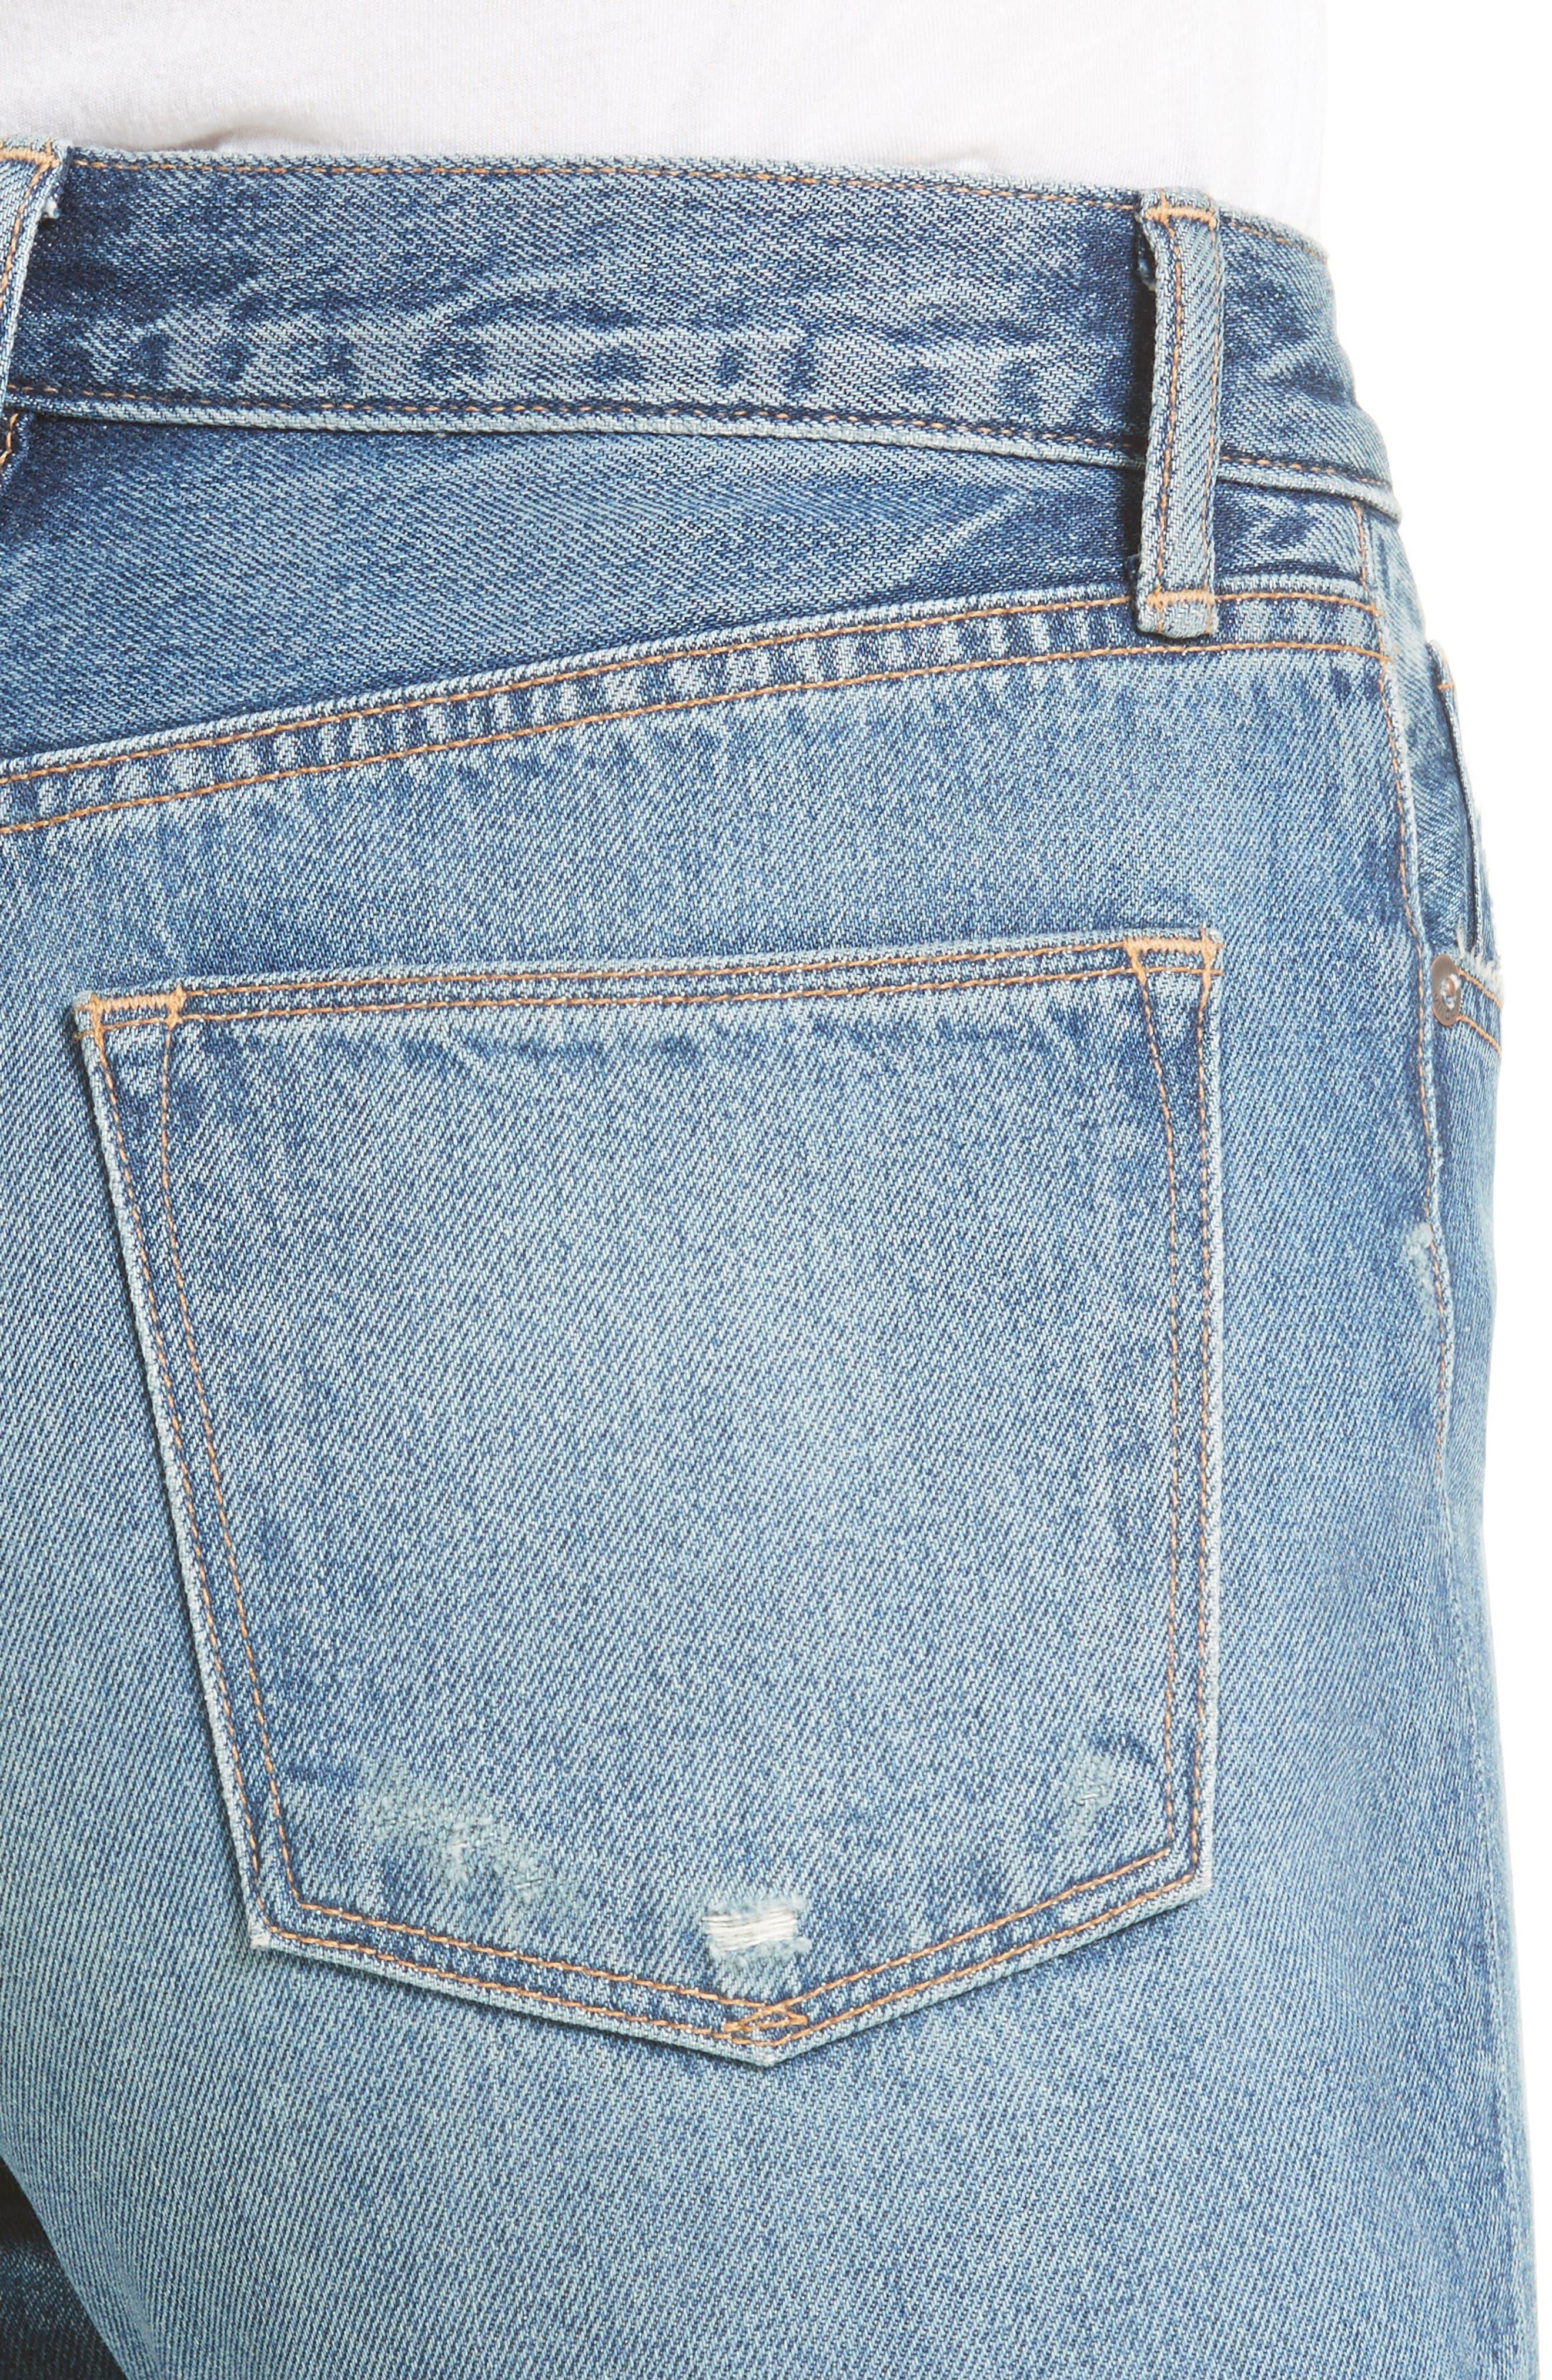 High Waist Vintage Straight Leg Jeans,                             Alternate thumbnail 4, color,                             Medium Wash